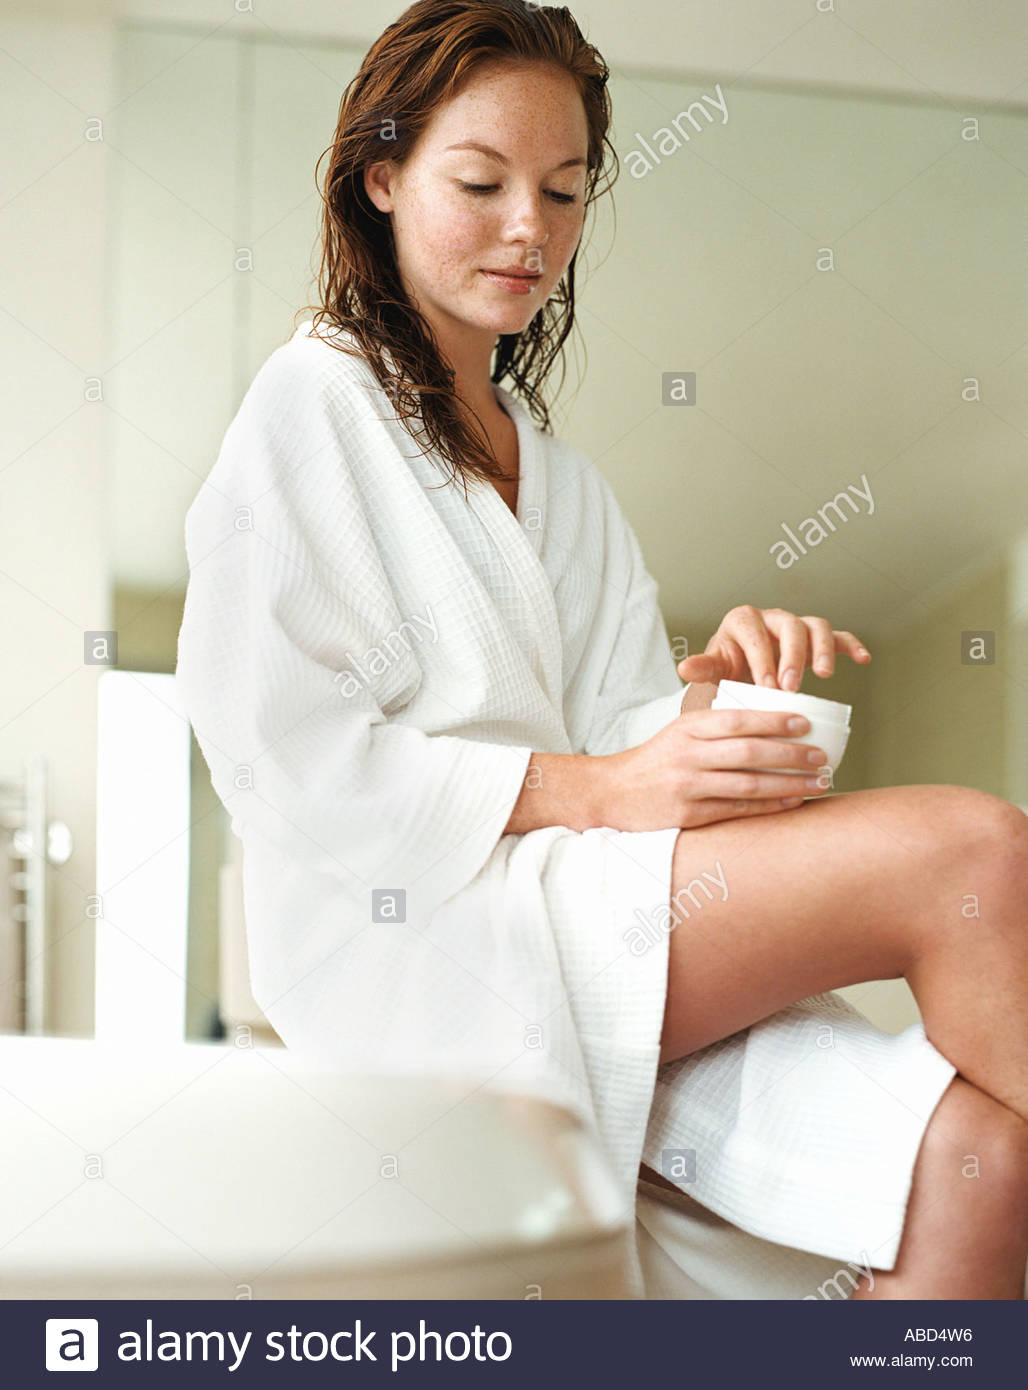 Young woman applying moisturiser - Stock Image